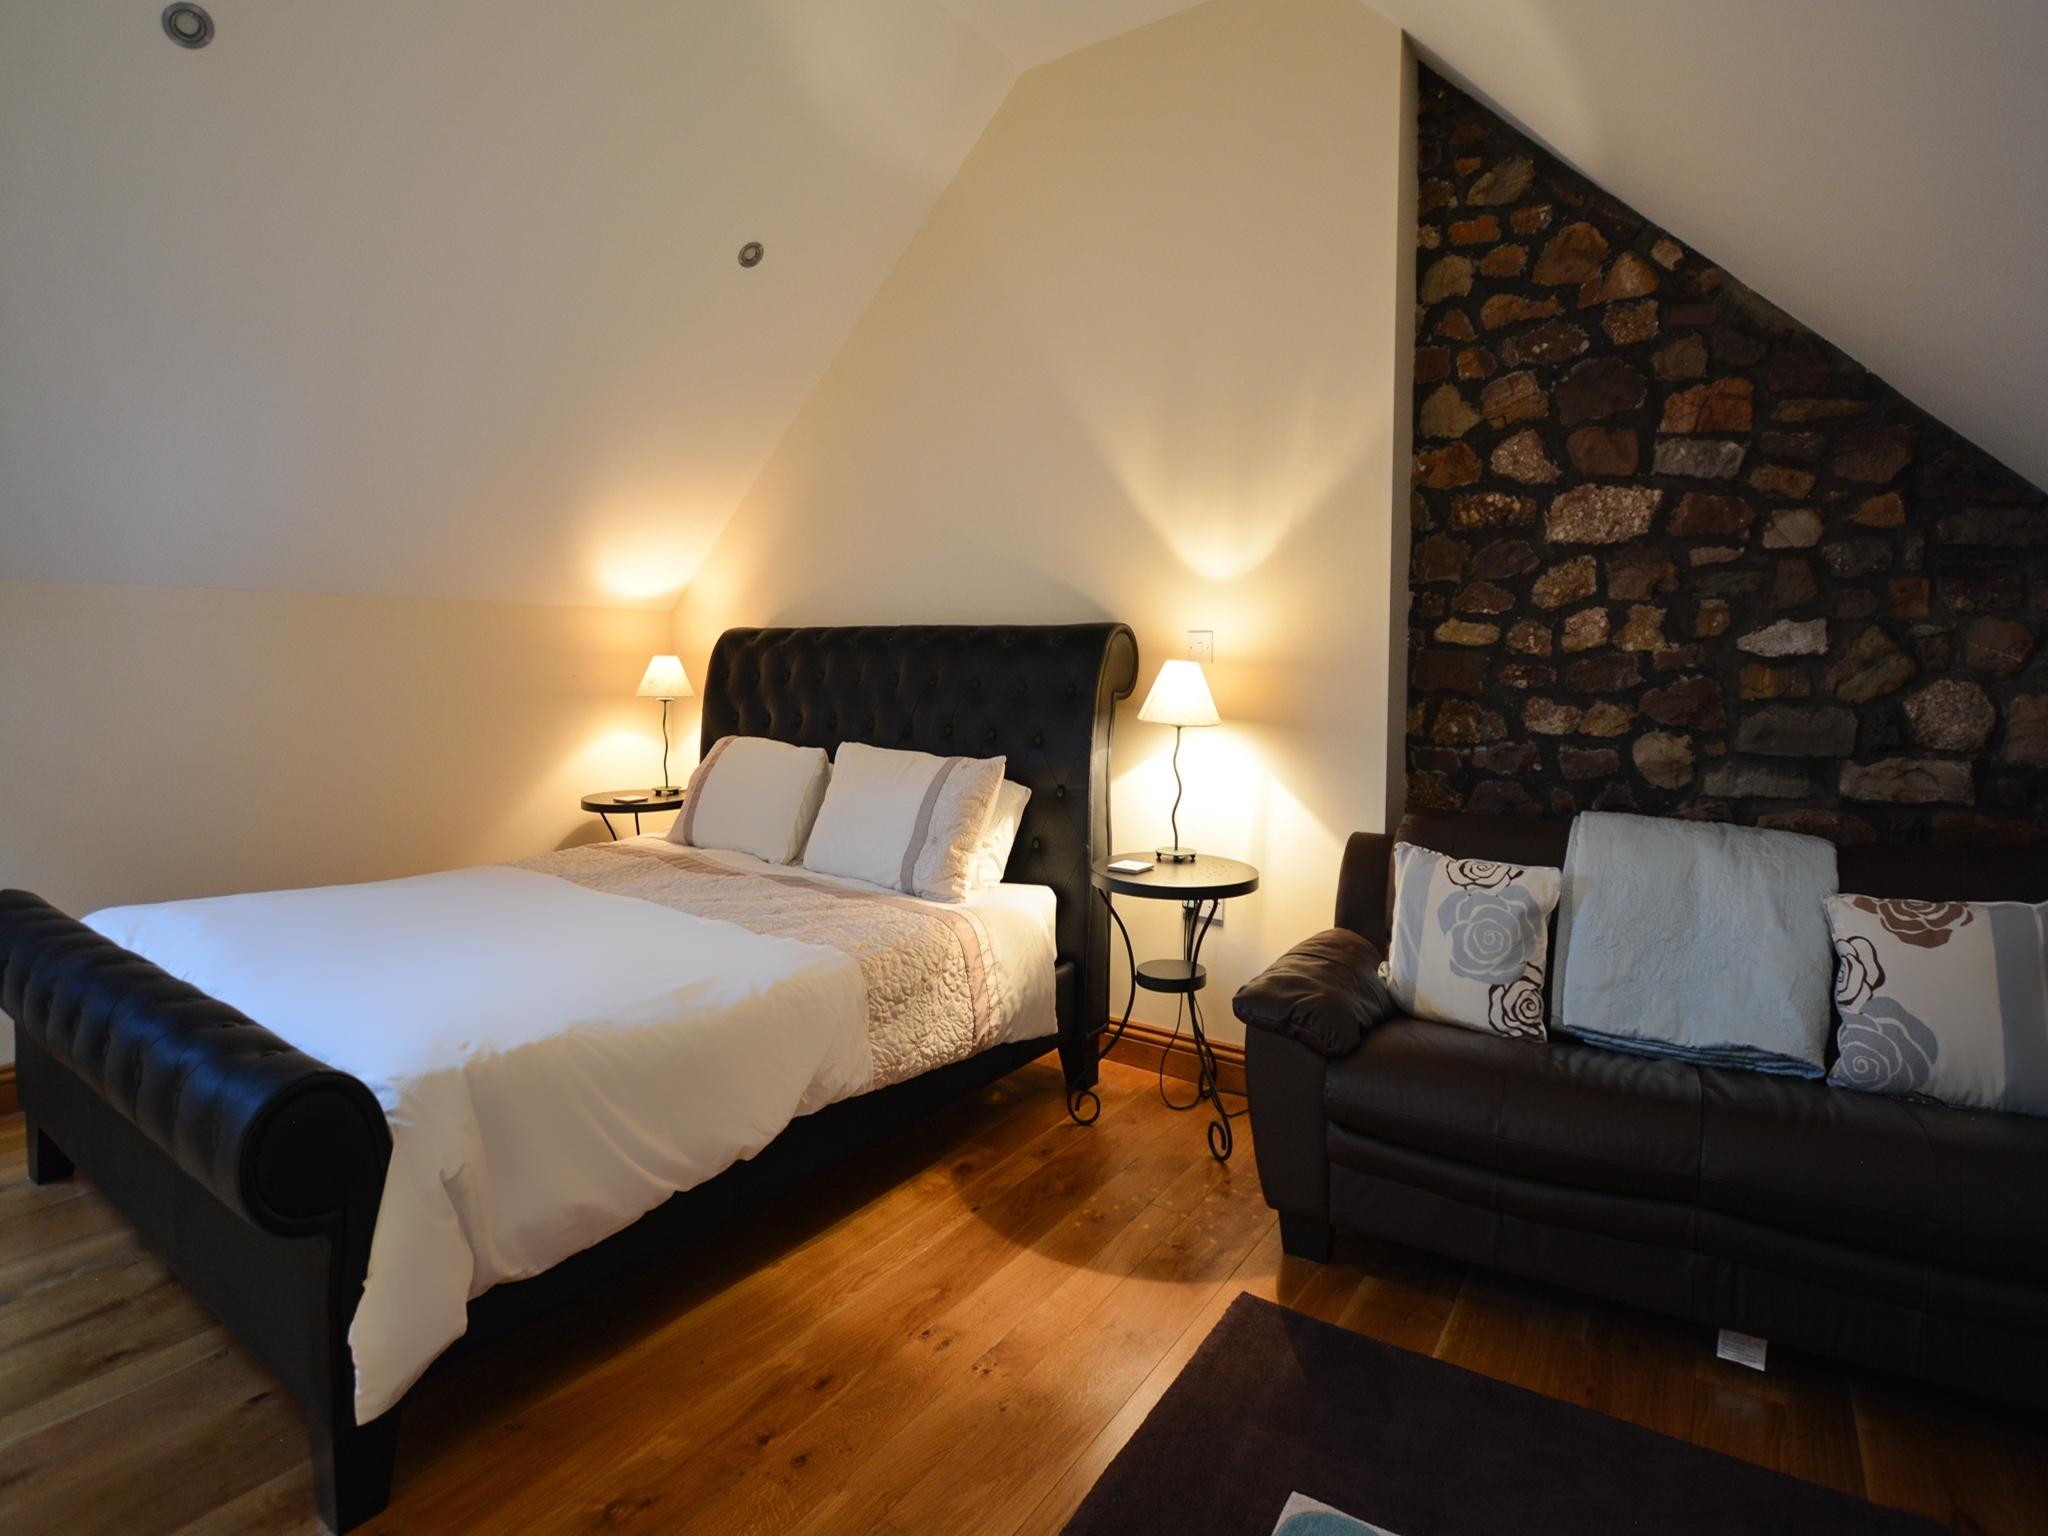 Barn-Signature-Private Bathroom-Mountain View-Ramblers Retreat - 3 Night Stays Ramblers